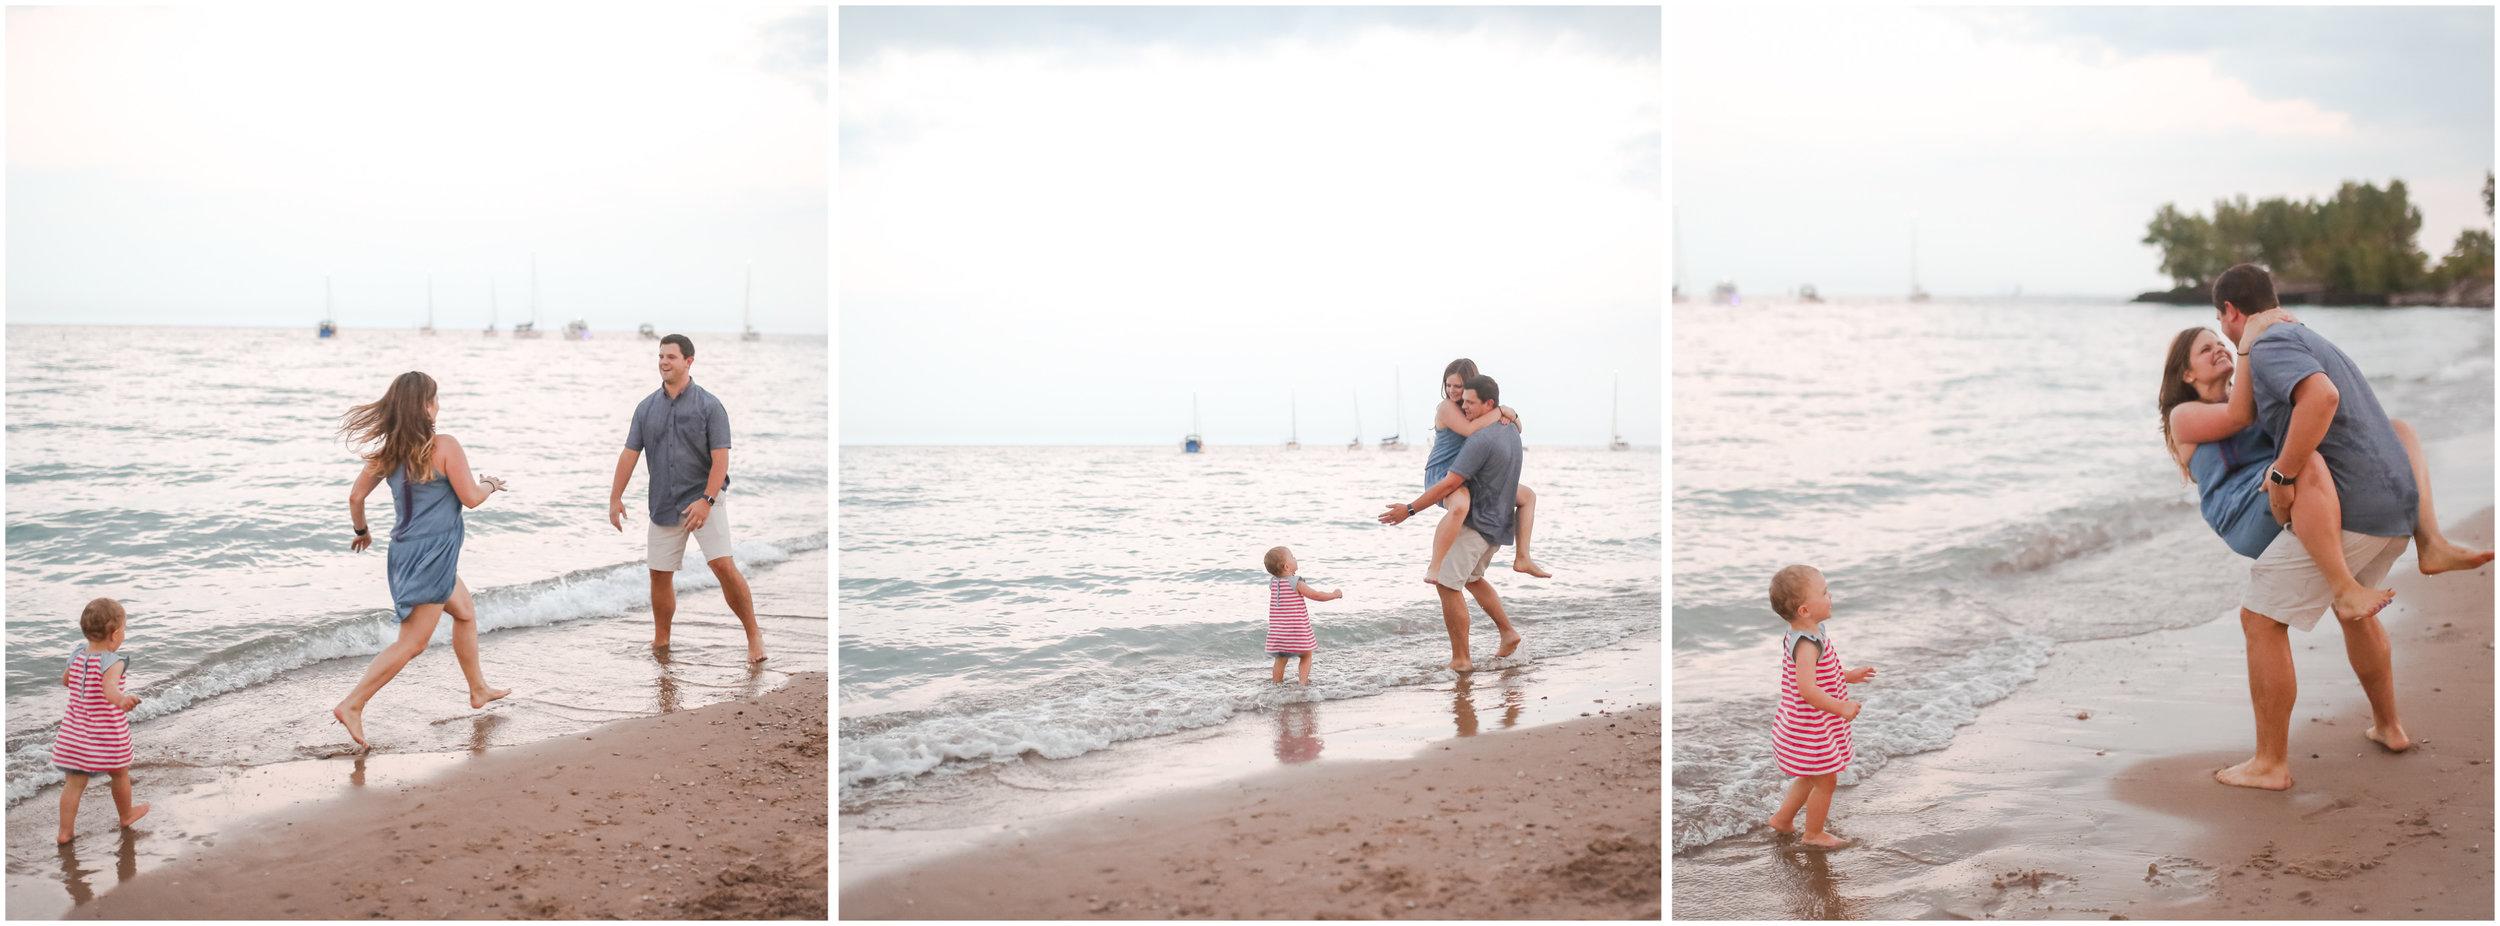 chicago family lifestyle photographer jenny grimm